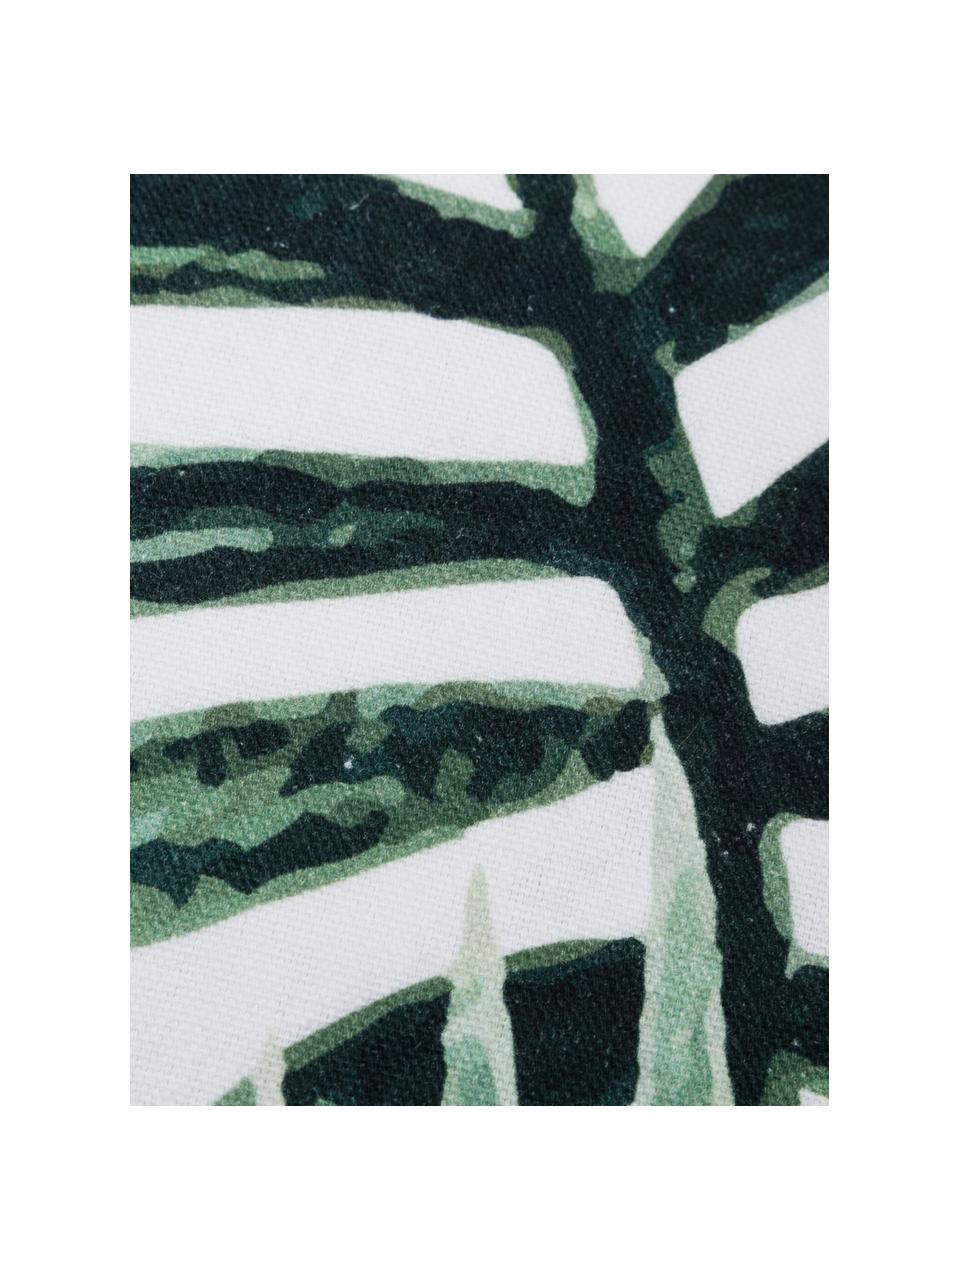 Federa arredo con motivo foglie Coast, 100% cotone, Verde, bianco, Larg. 40 x Lung. 40 cm